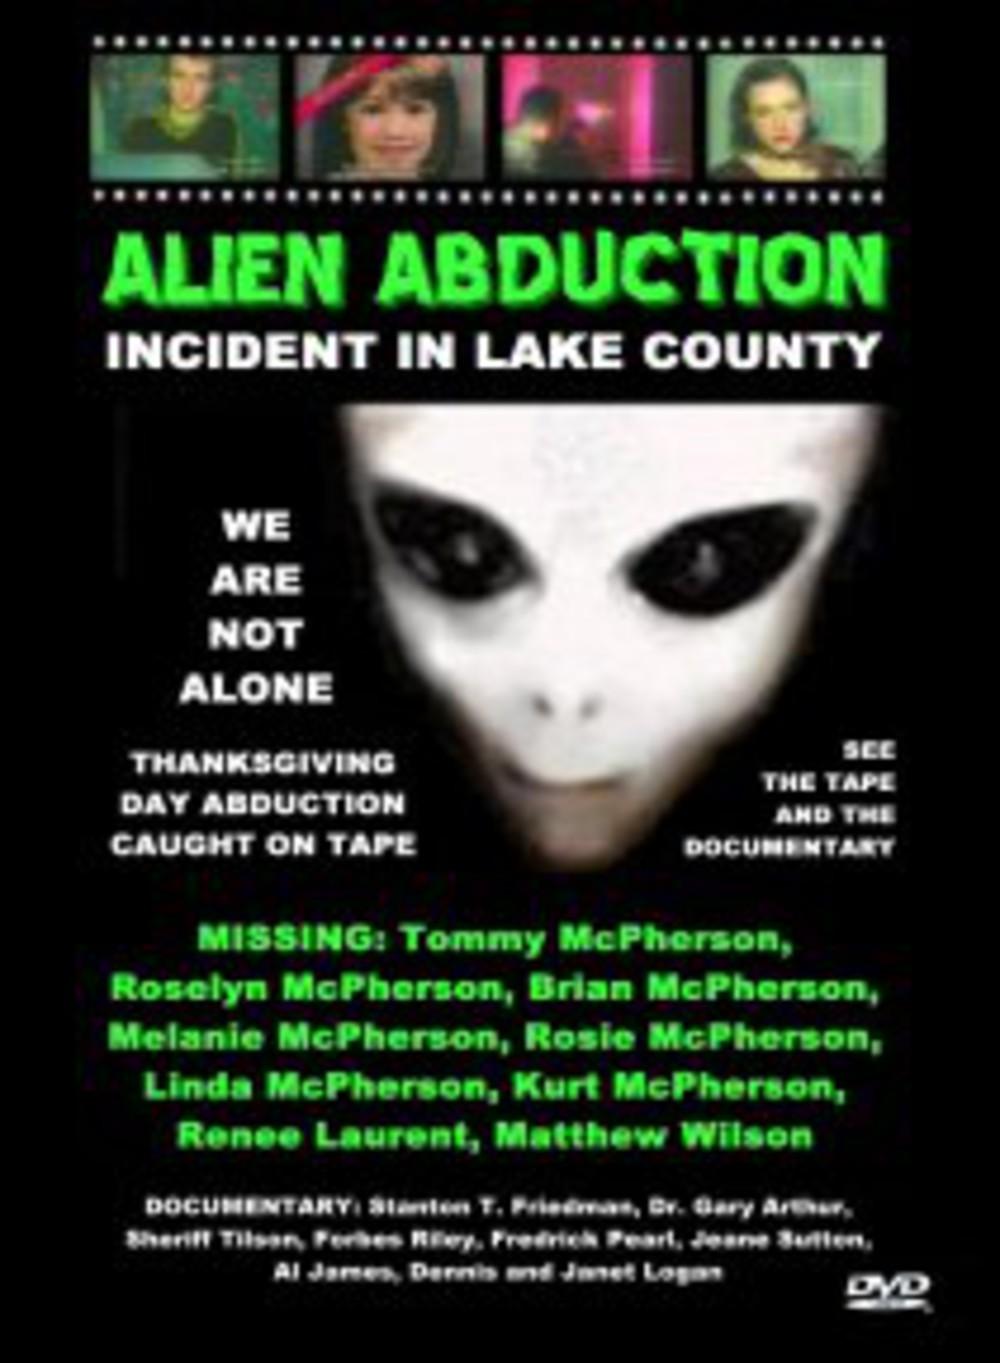 CIVIC-TV: Alien Abduction: Incident in Lake County, Dean Alioto, 1998